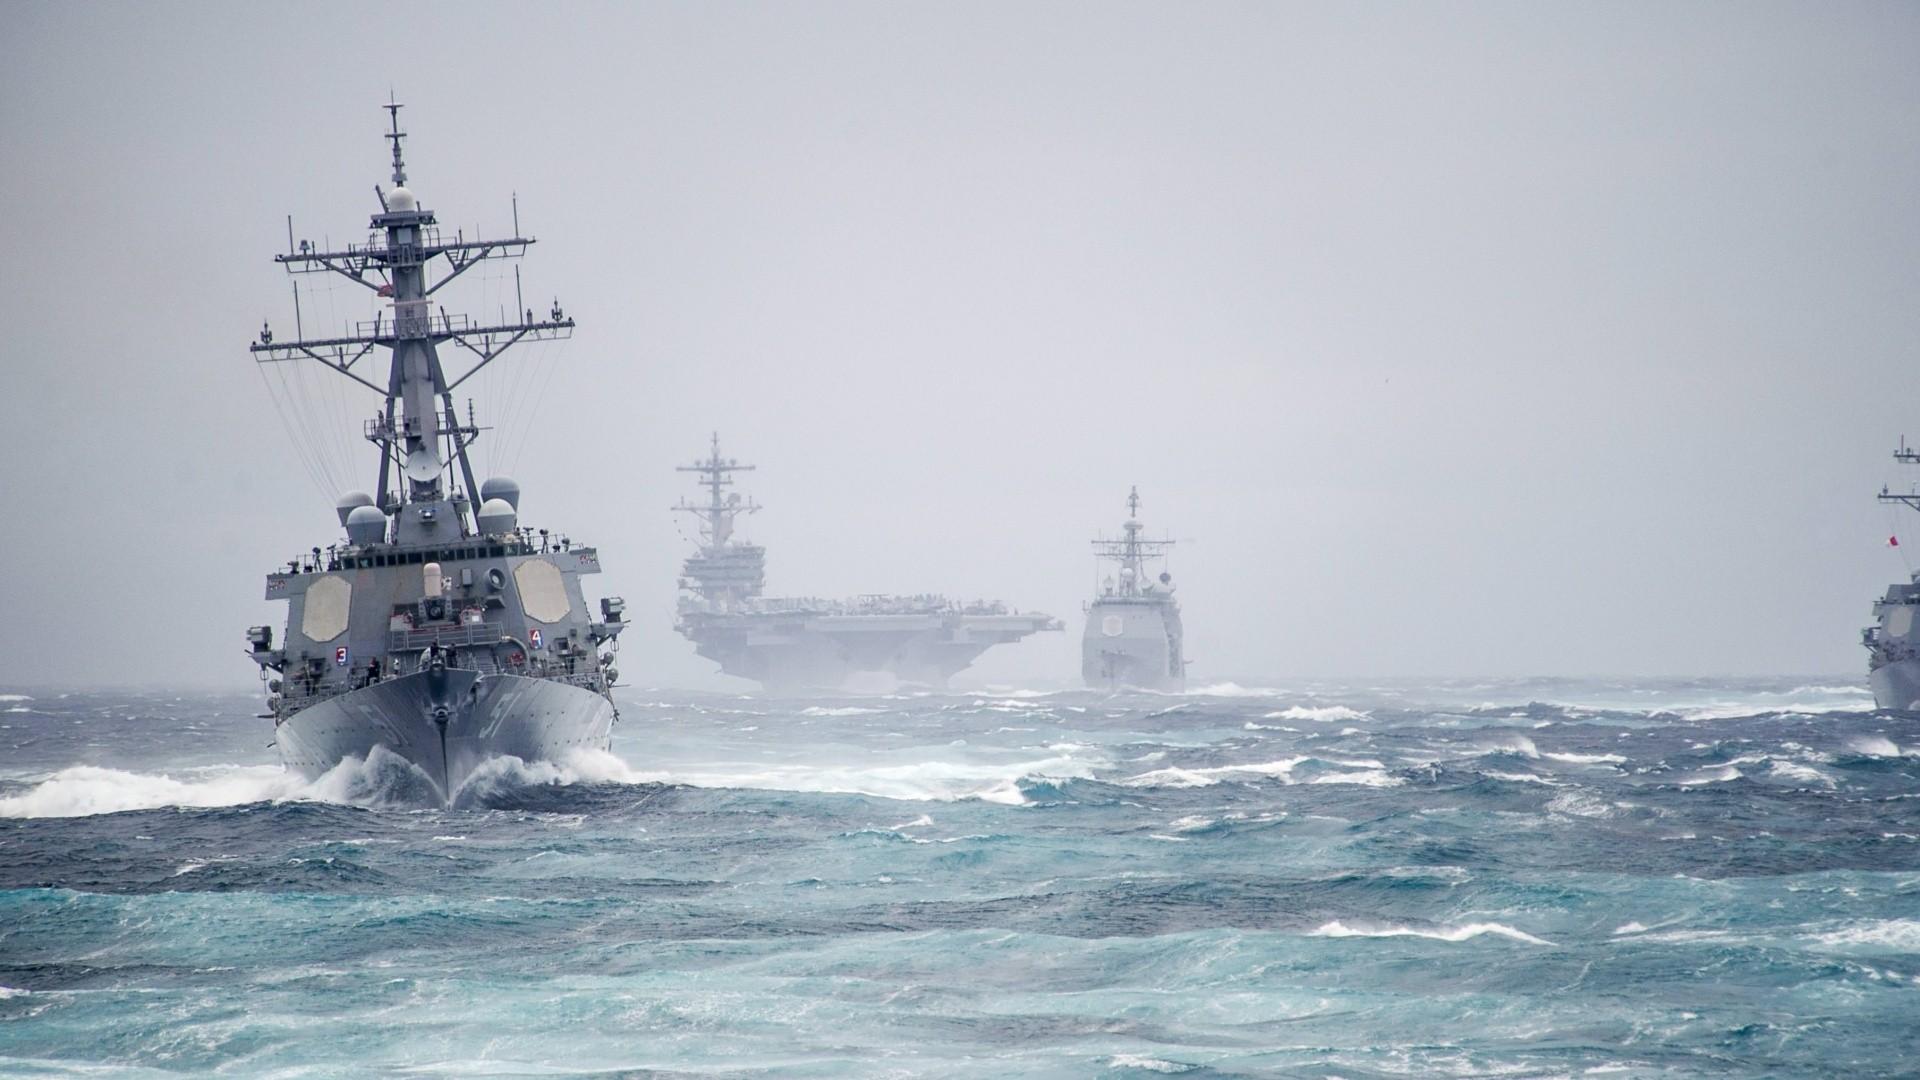 Us Navy Image